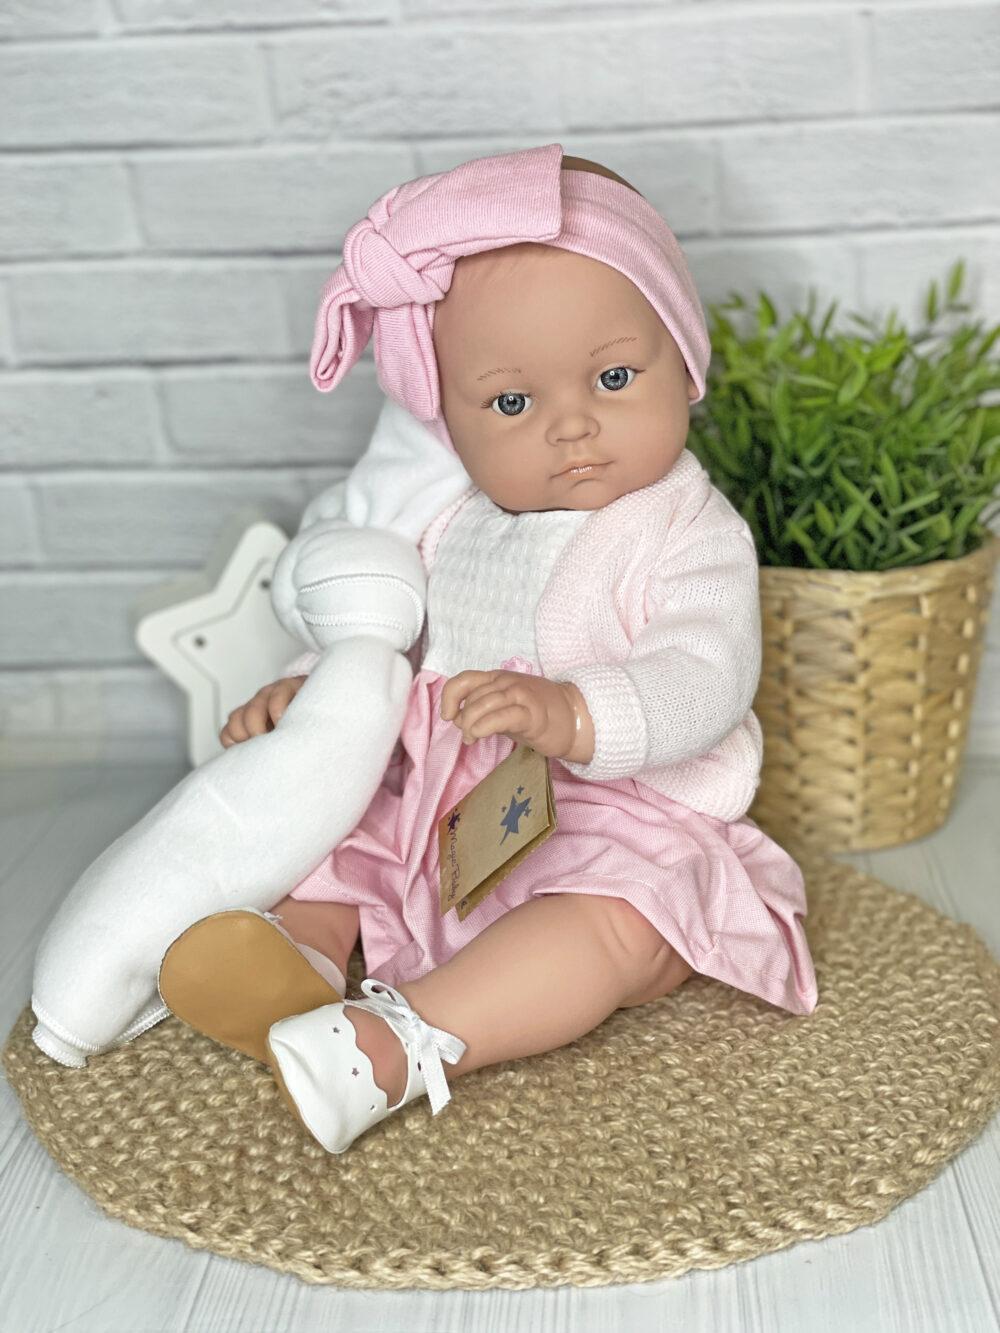 Кукла Алисия в розовом костюме